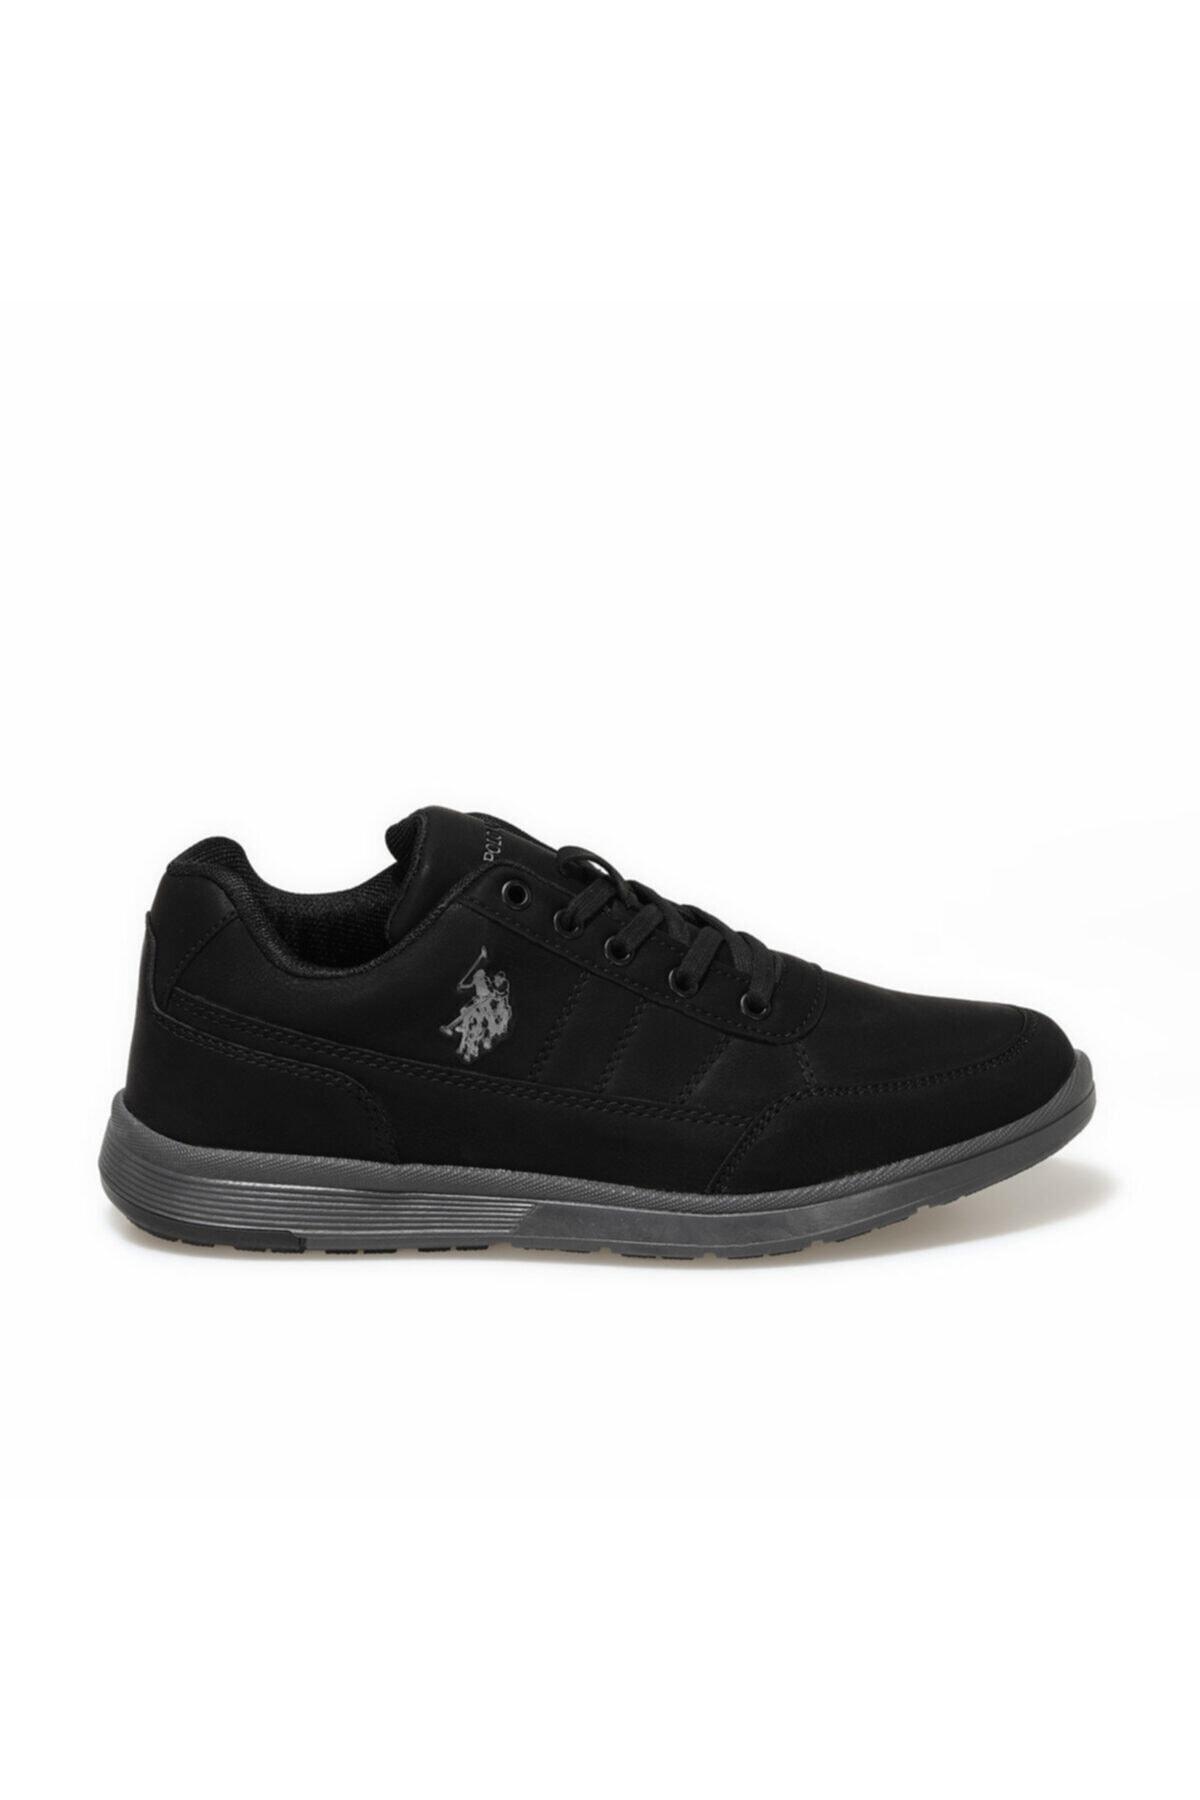 U.S. Polo Assn. LION Siyah Erkek Ayakkabı 100550085 2